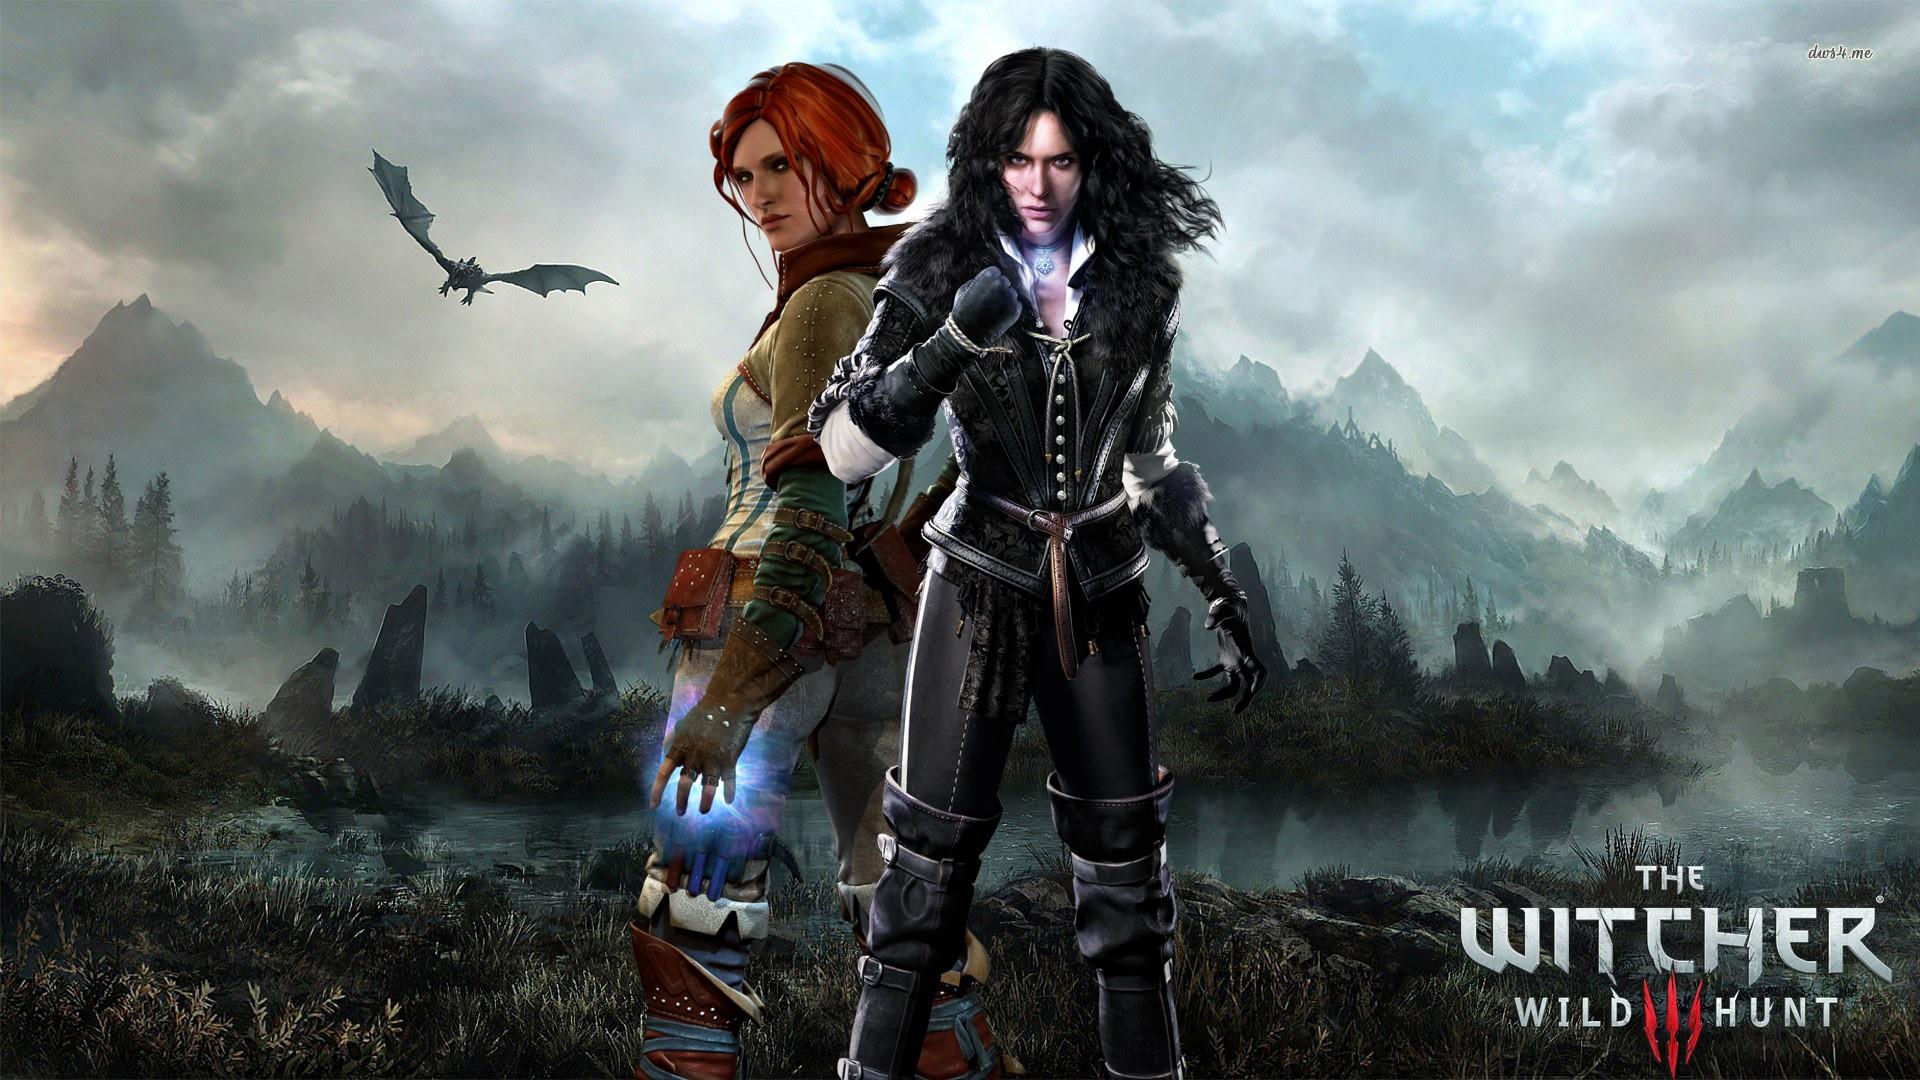 Wallpaper The Witcher 3 Wild Hunt Triss Merigold Mythology